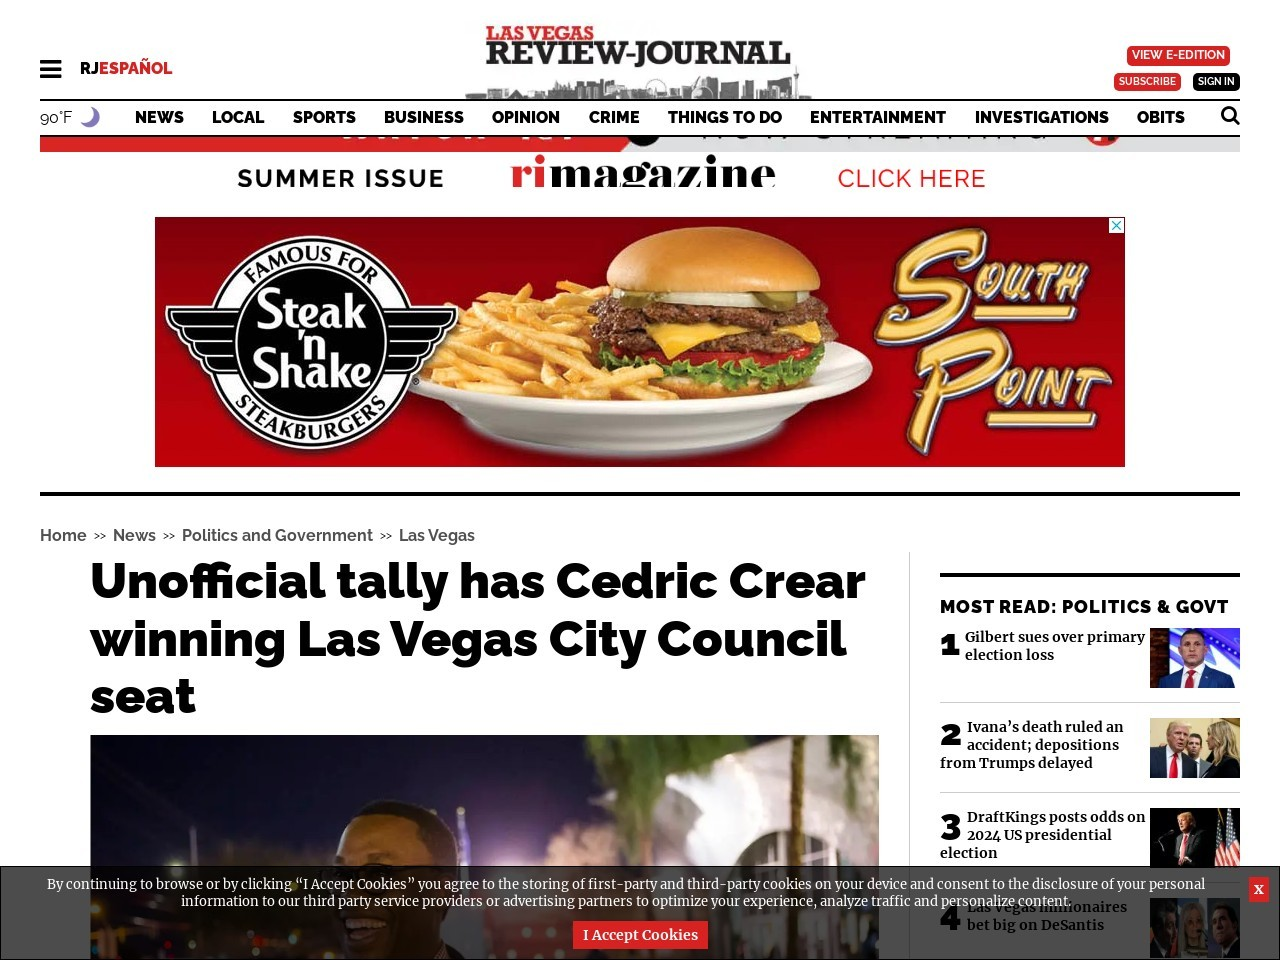 Unofficial tally has Cedric Crear winning Las Vegas City Council seat